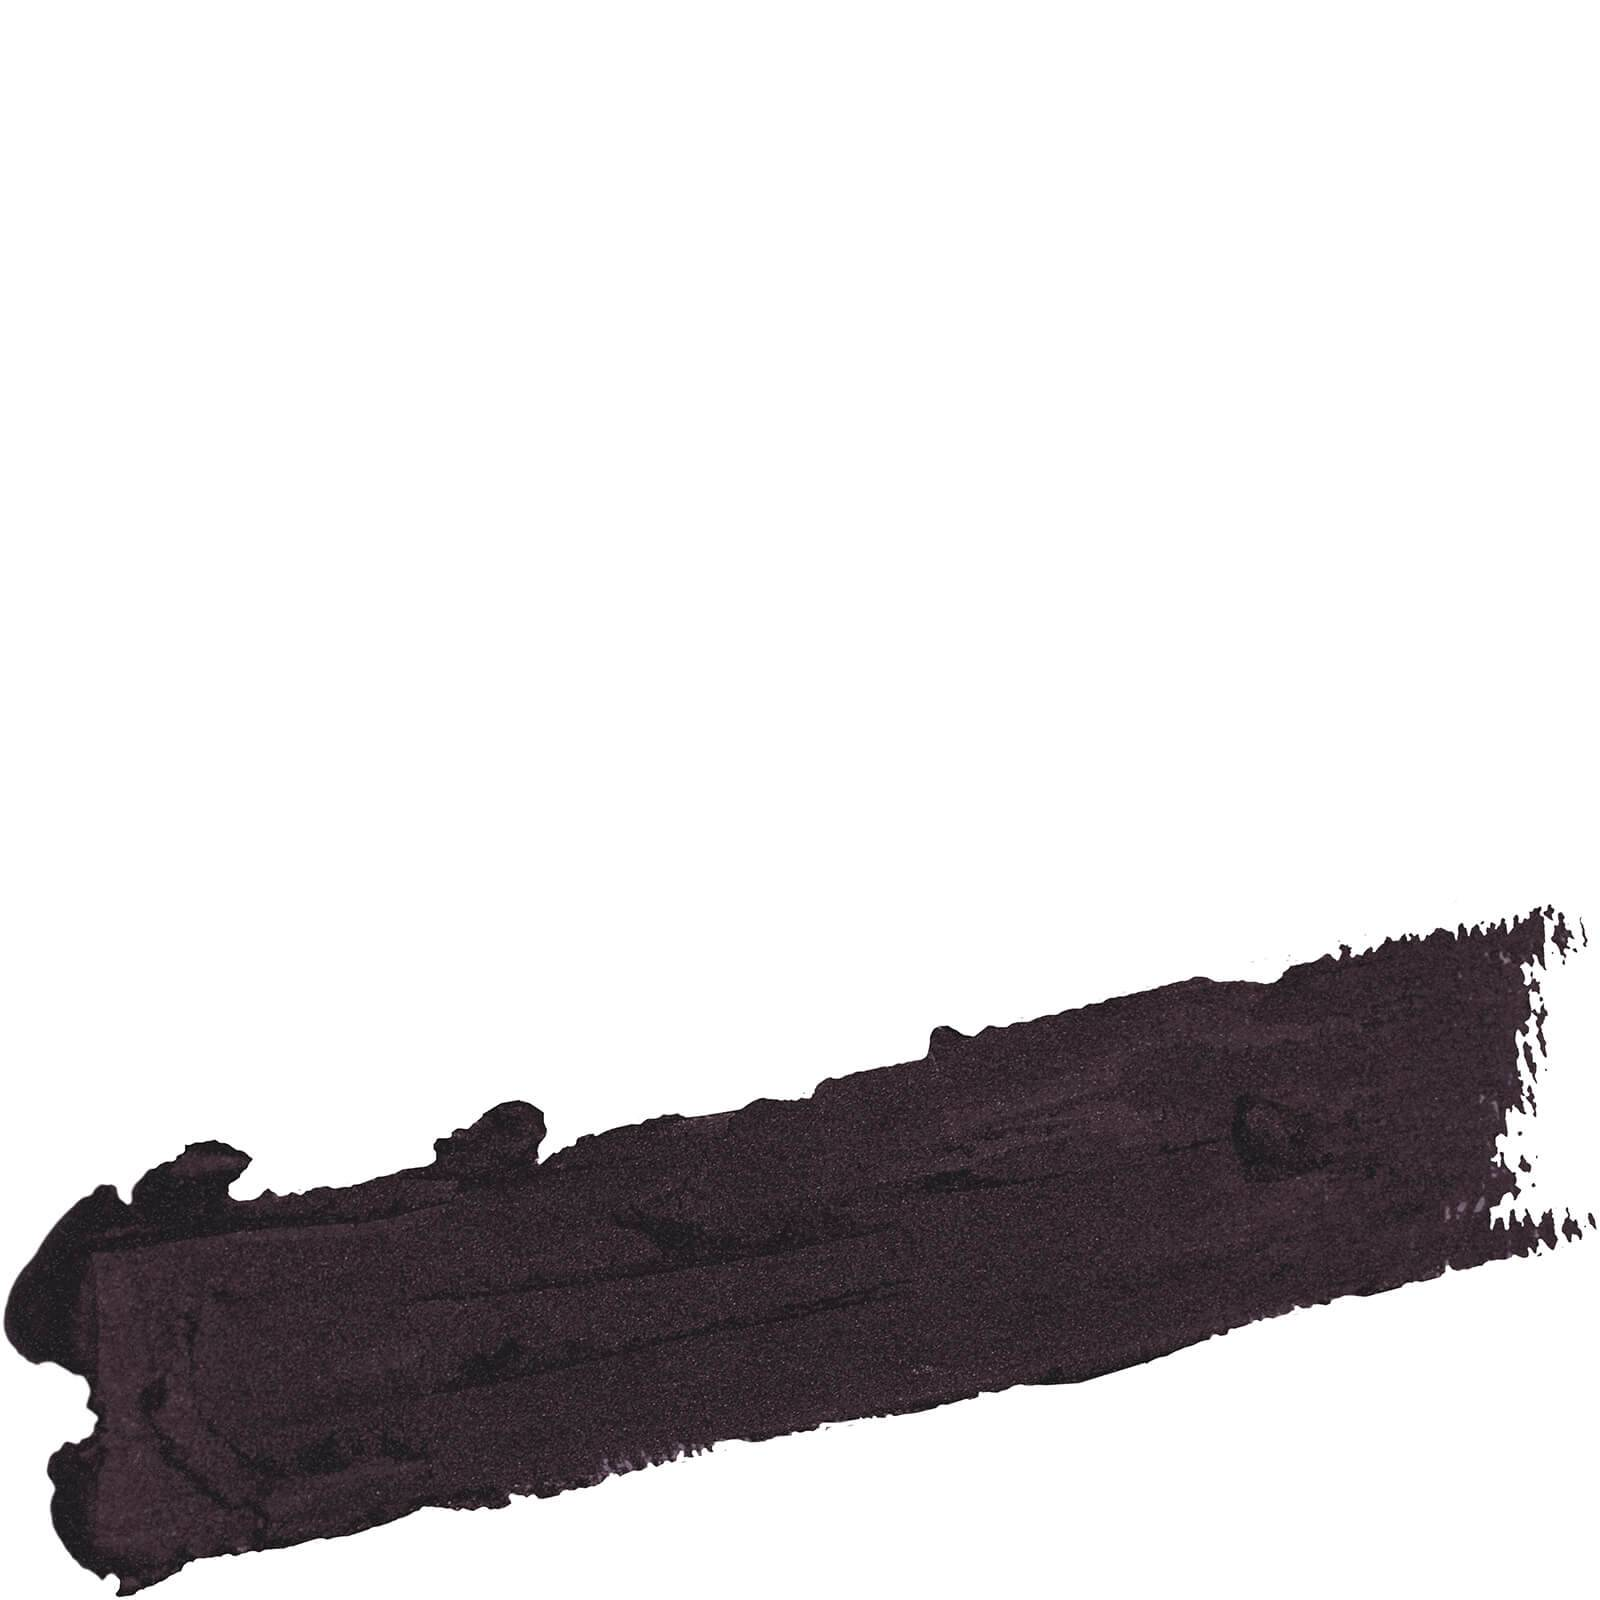 By Terry Stylo Blackstar Eye Liner 1.4g (Various Shades) - No.2 Purpulyn Gem